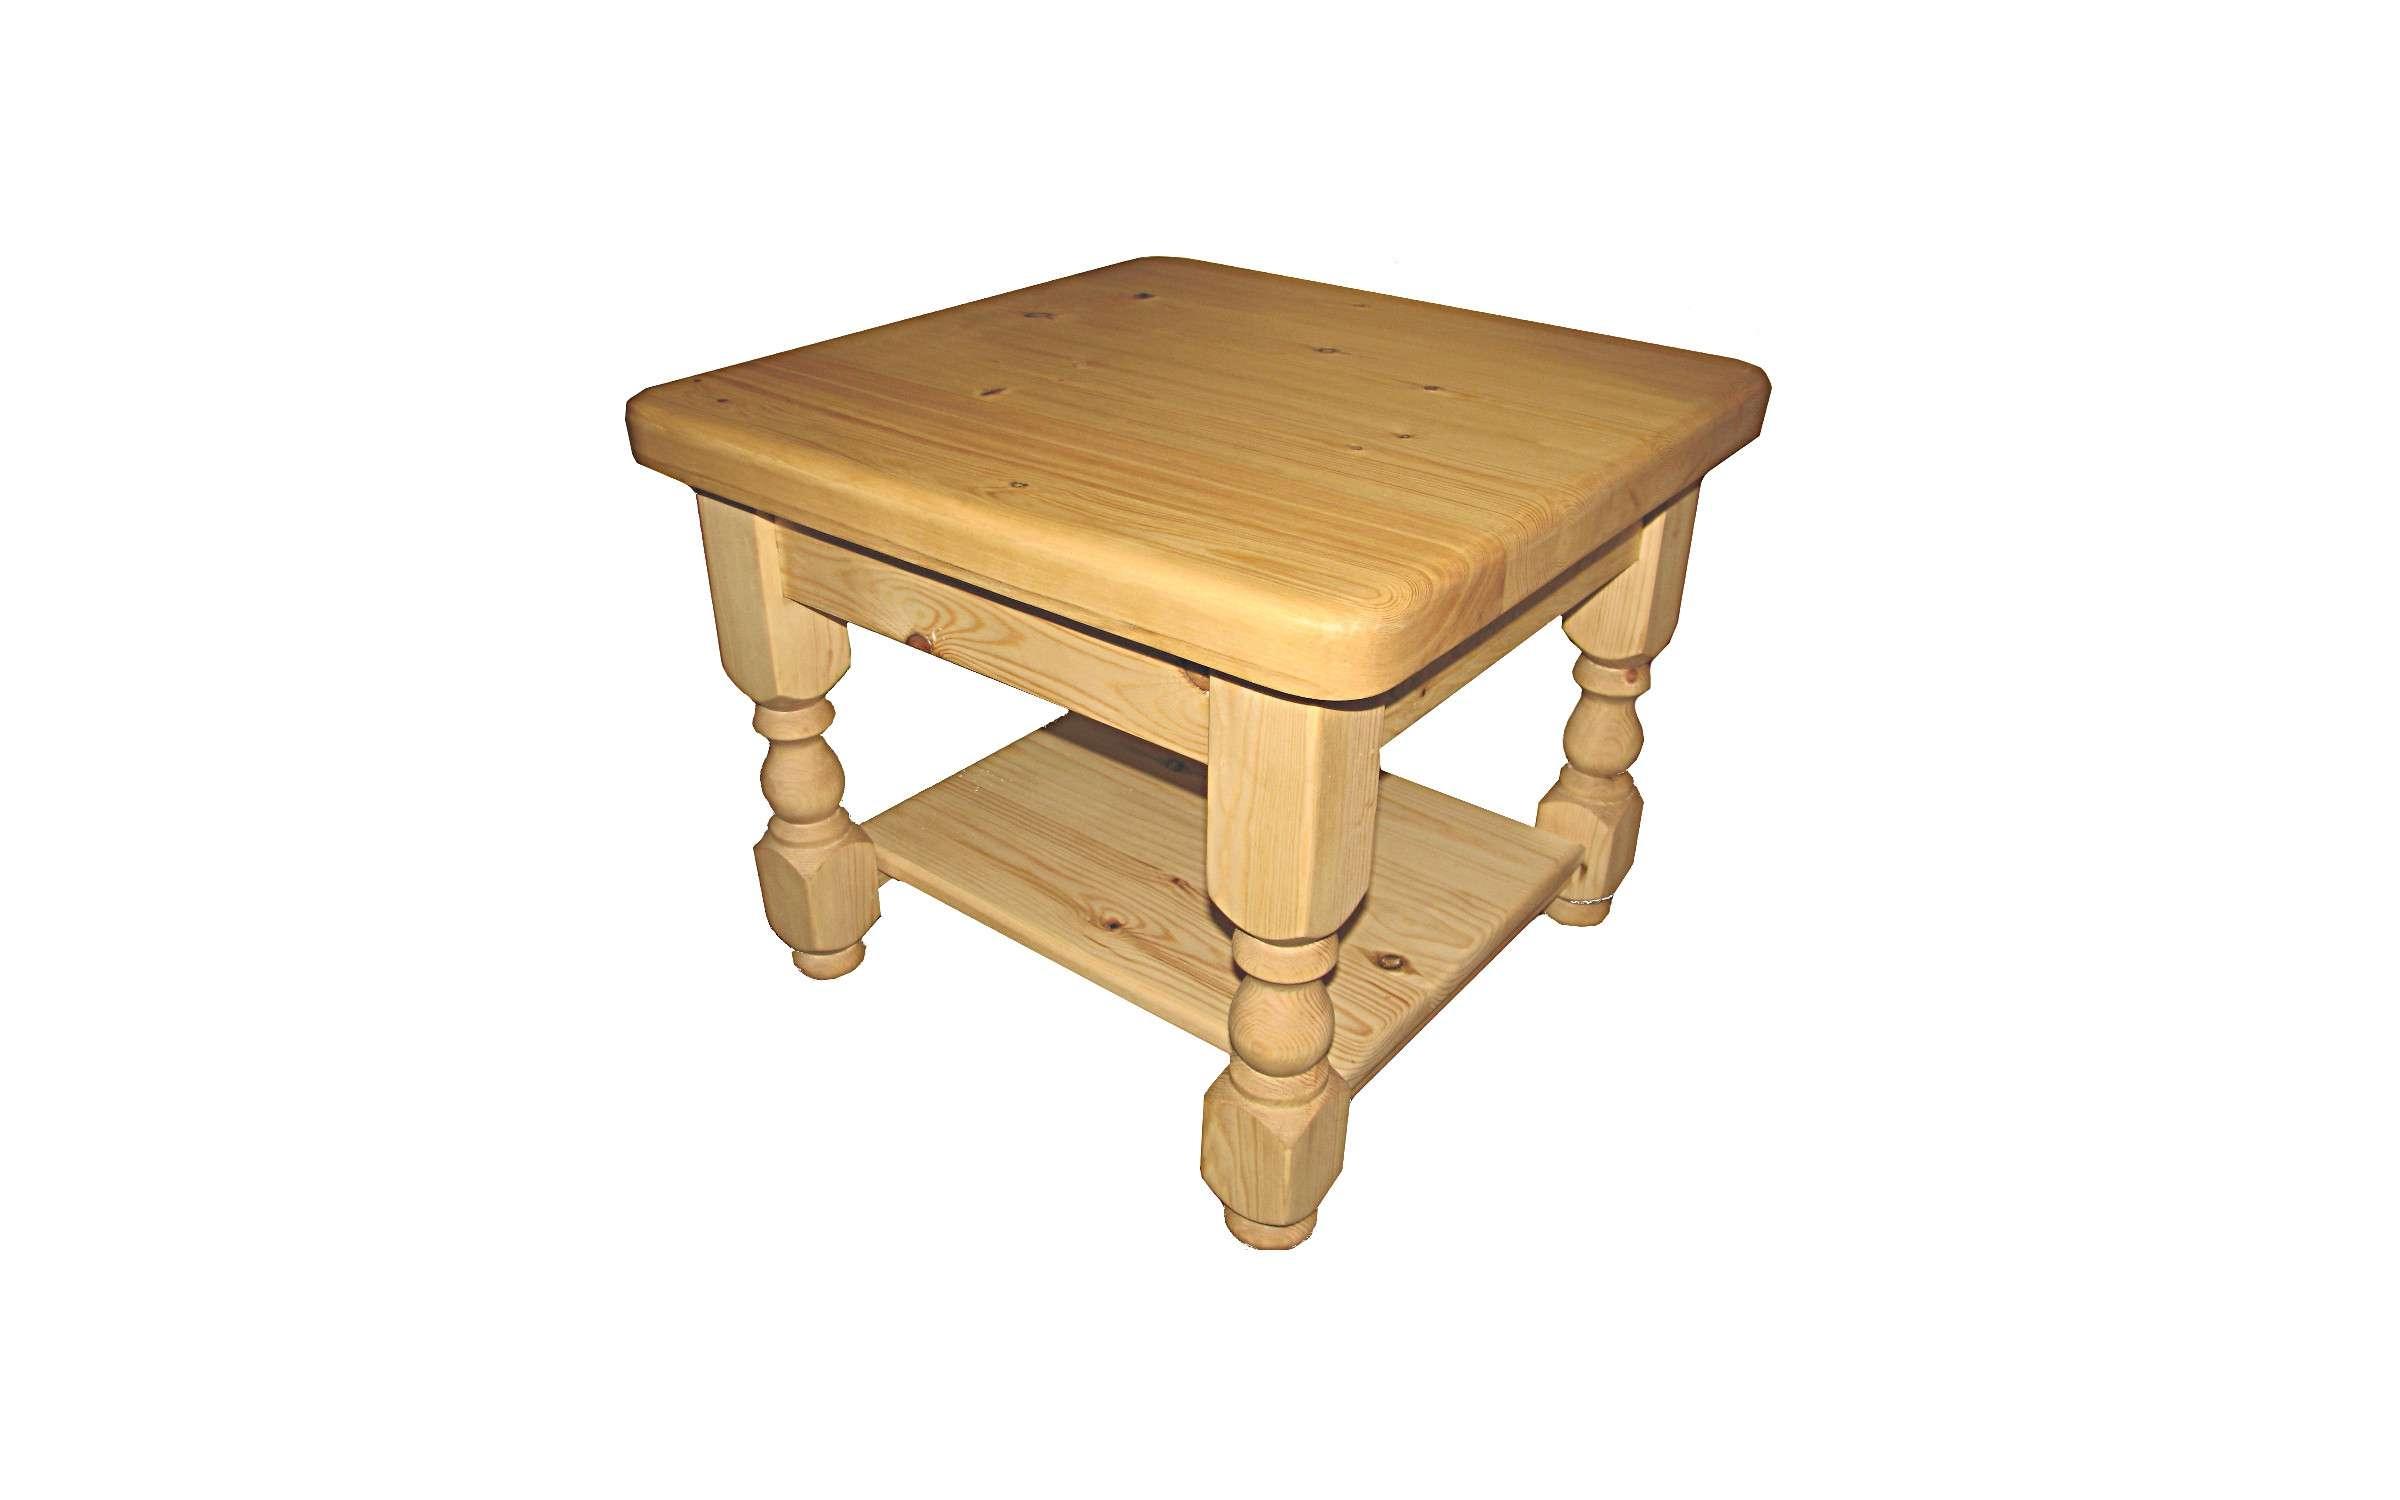 Coffee Tables – Kerris Farmhouse Pine Regarding Fashionable Square Pine Coffee Tables (View 3 of 20)